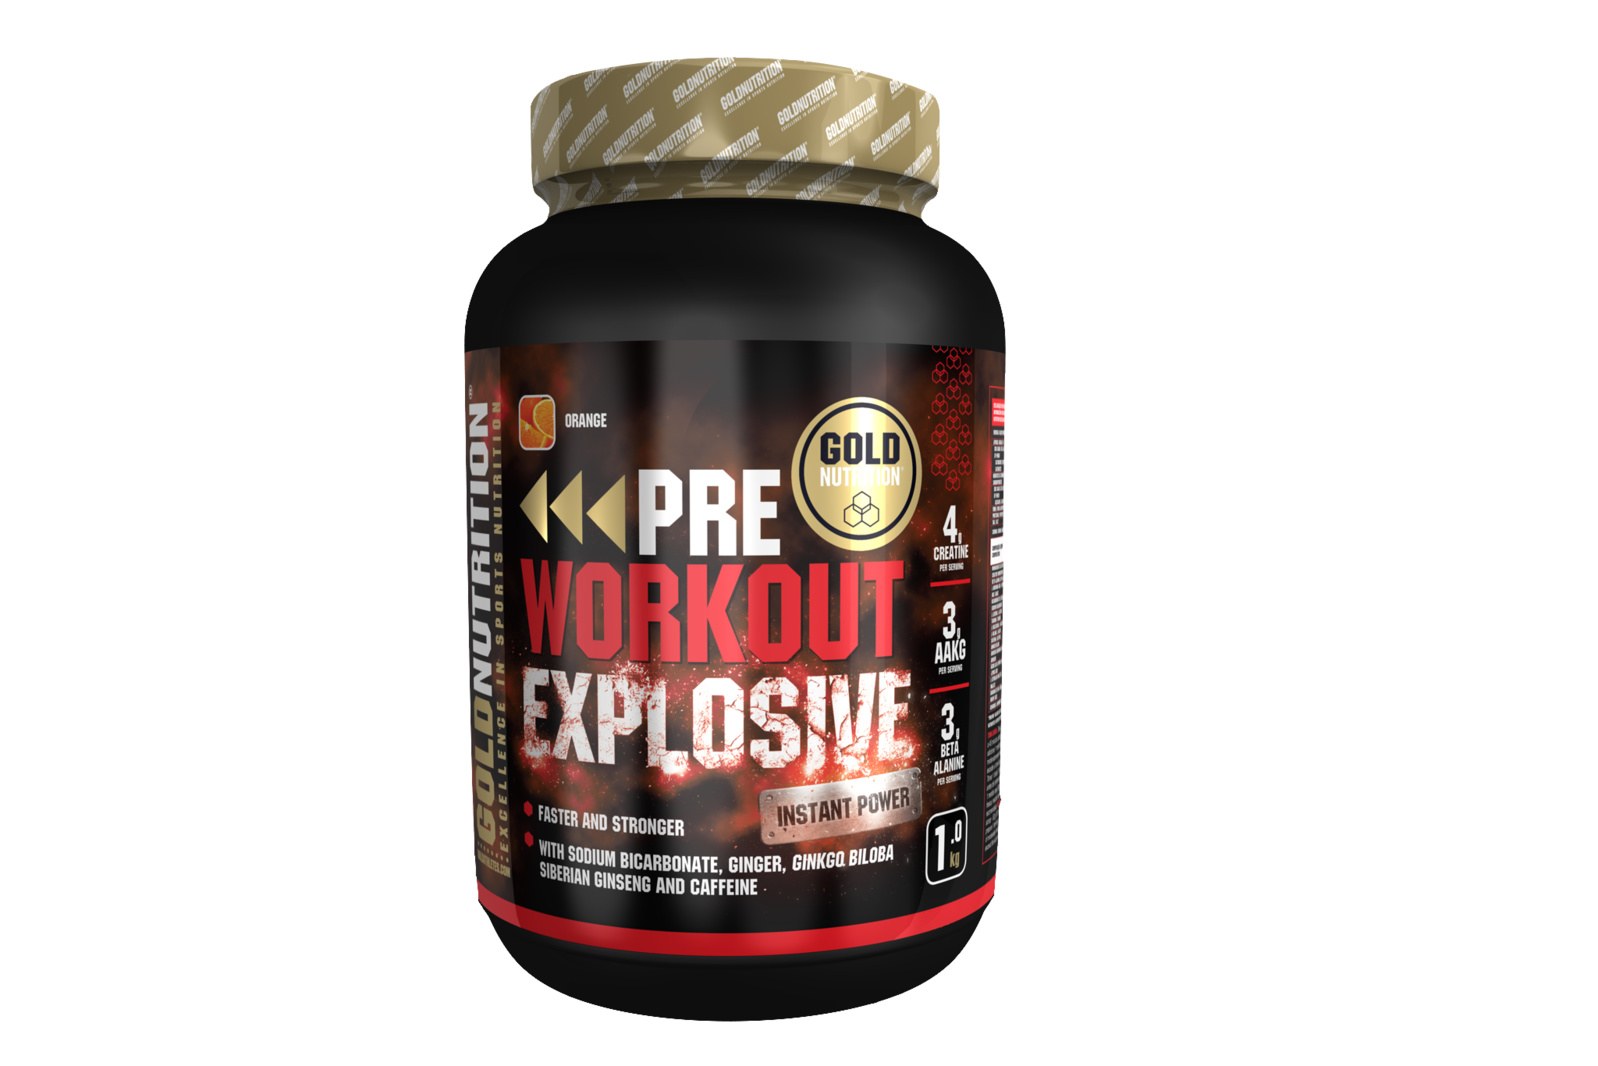 GOLDNUTRITION PRE-WORKOUT EXPLOSIVE 1 KG